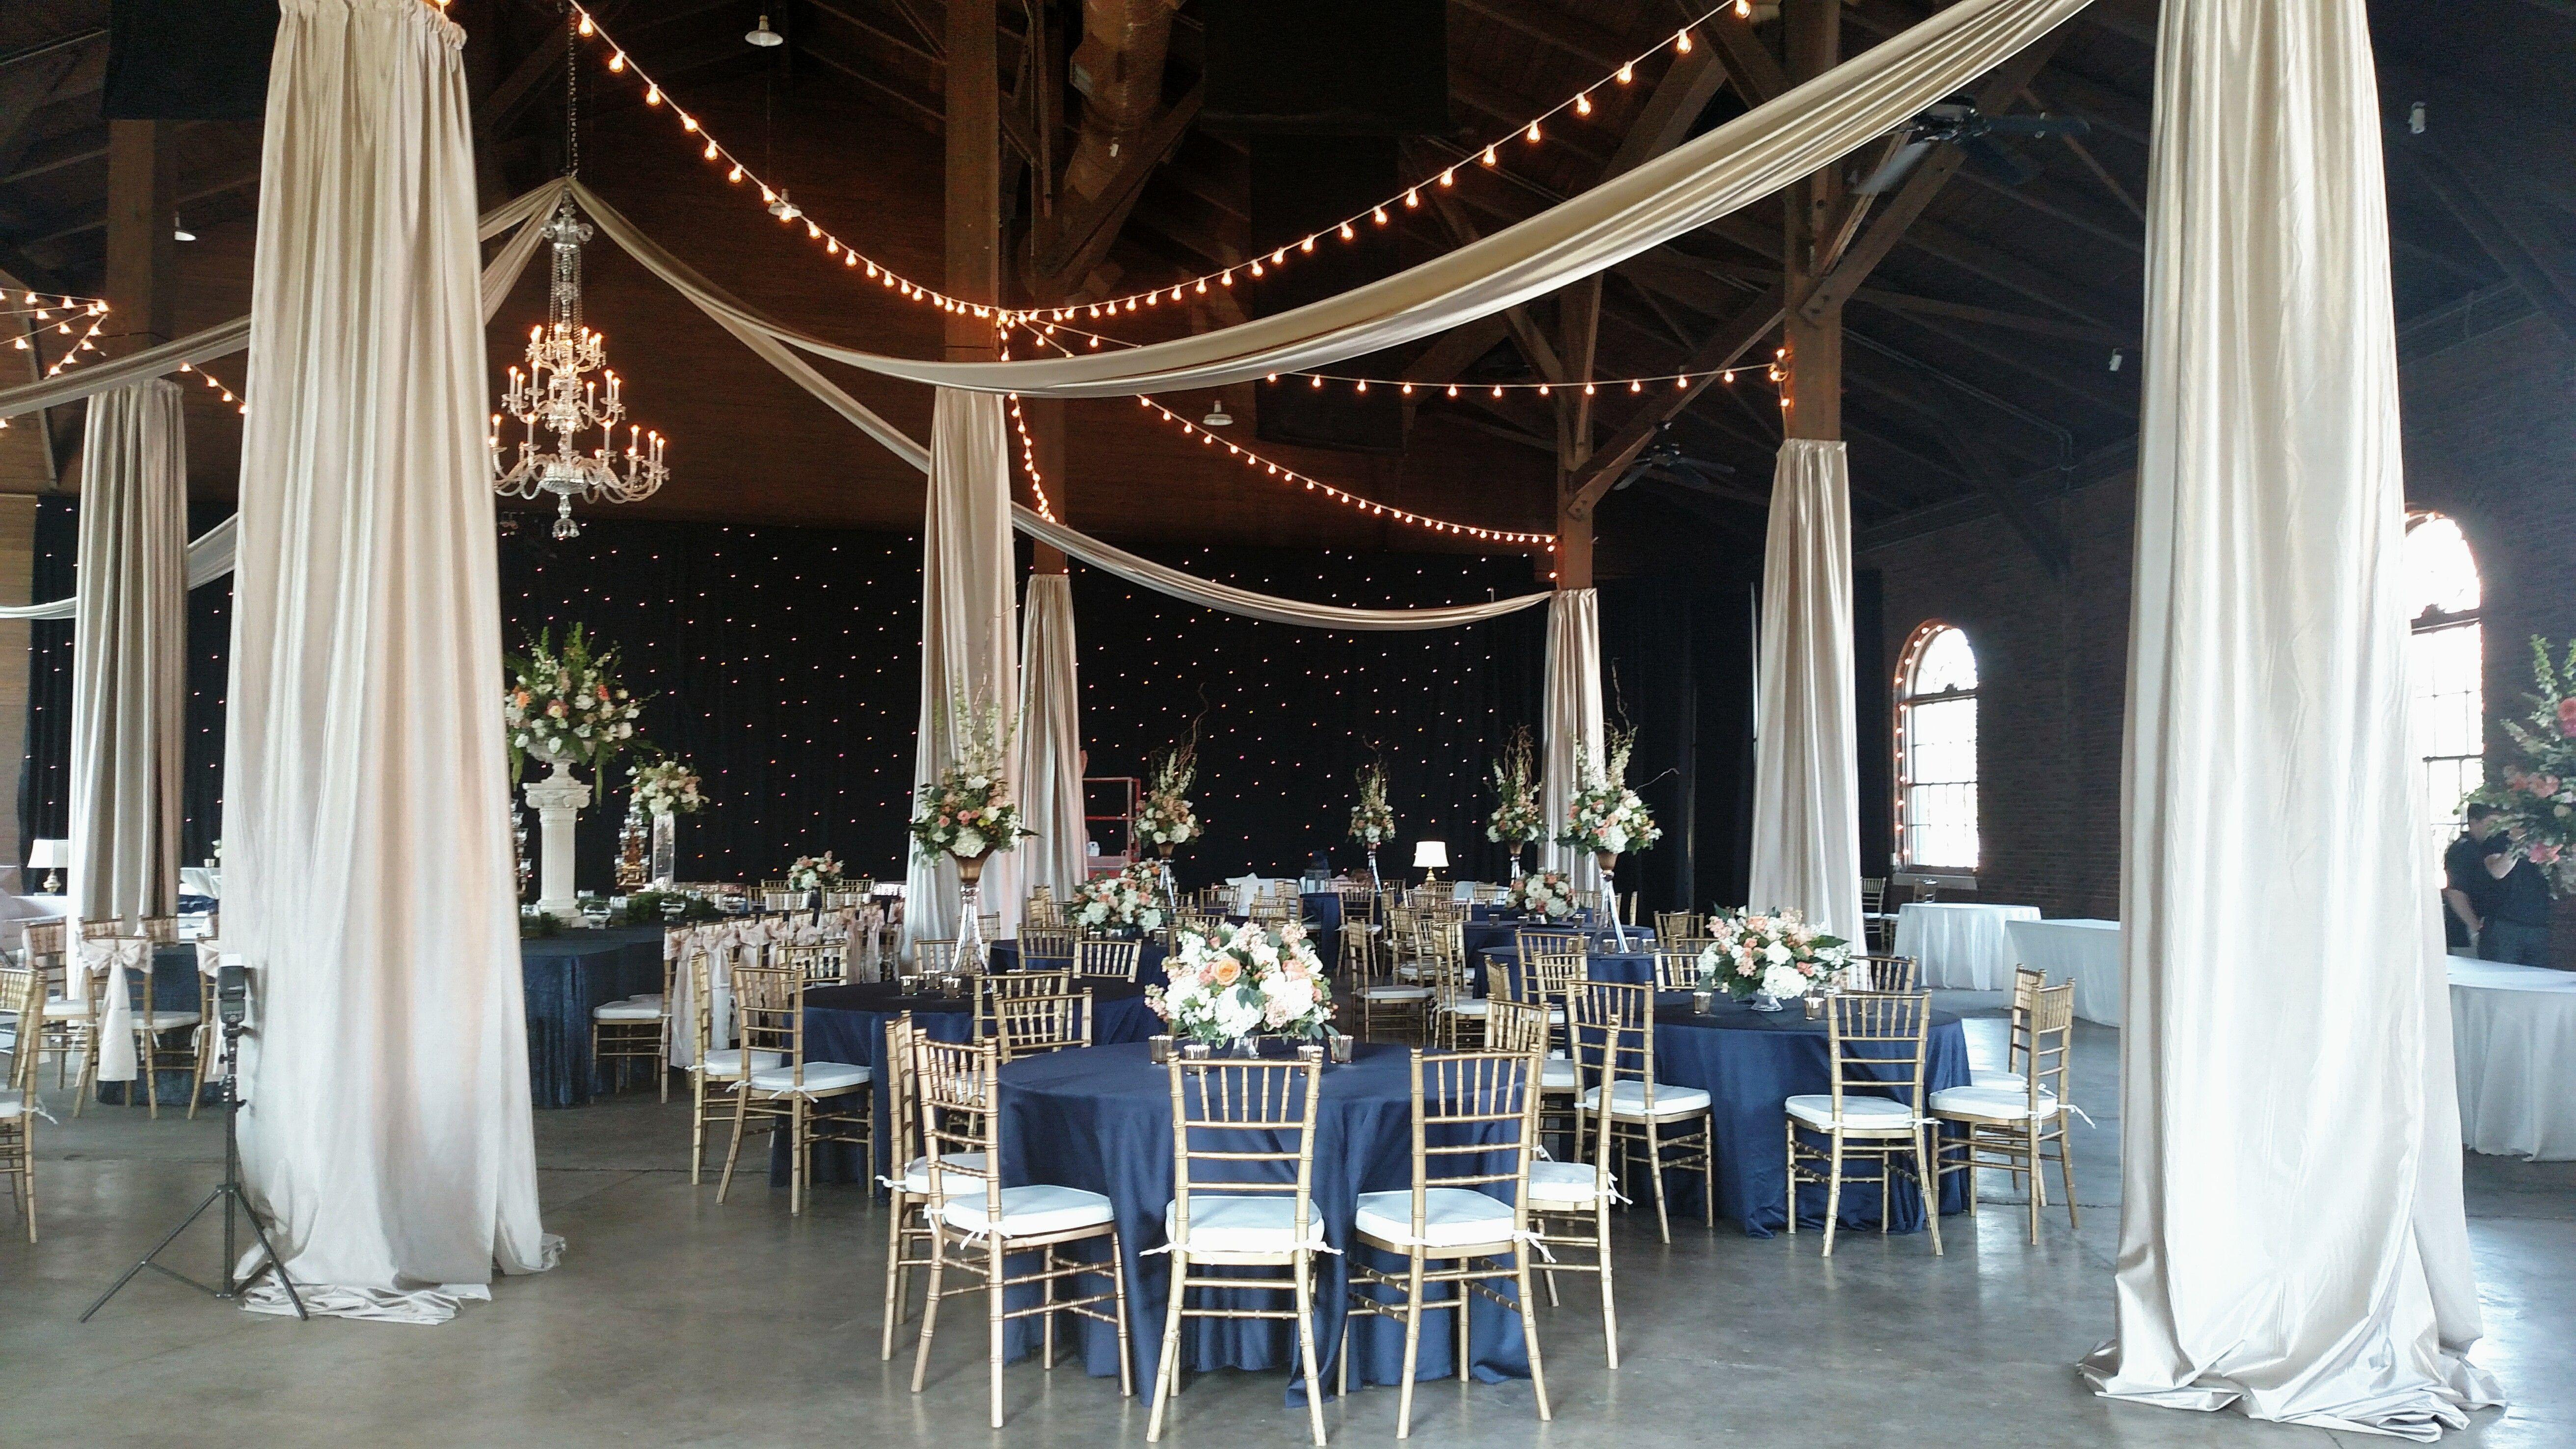 Huntsville Historic Depot Roundhouse Wedding Venue Round House Wedding Venues Venues